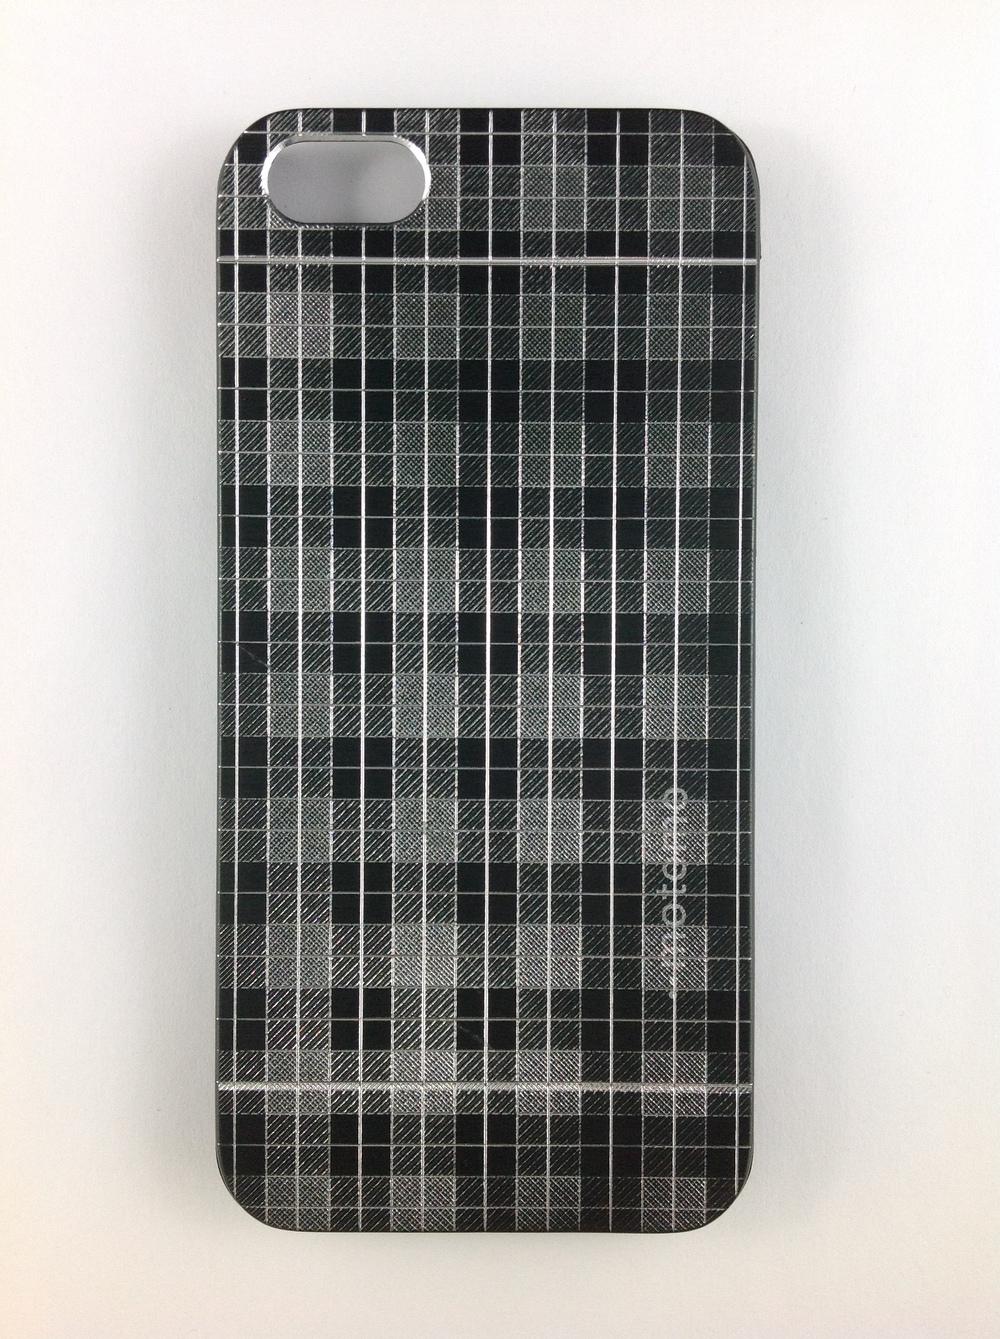 DigitalCarver-iPhone5s-IMG_3688.JPG